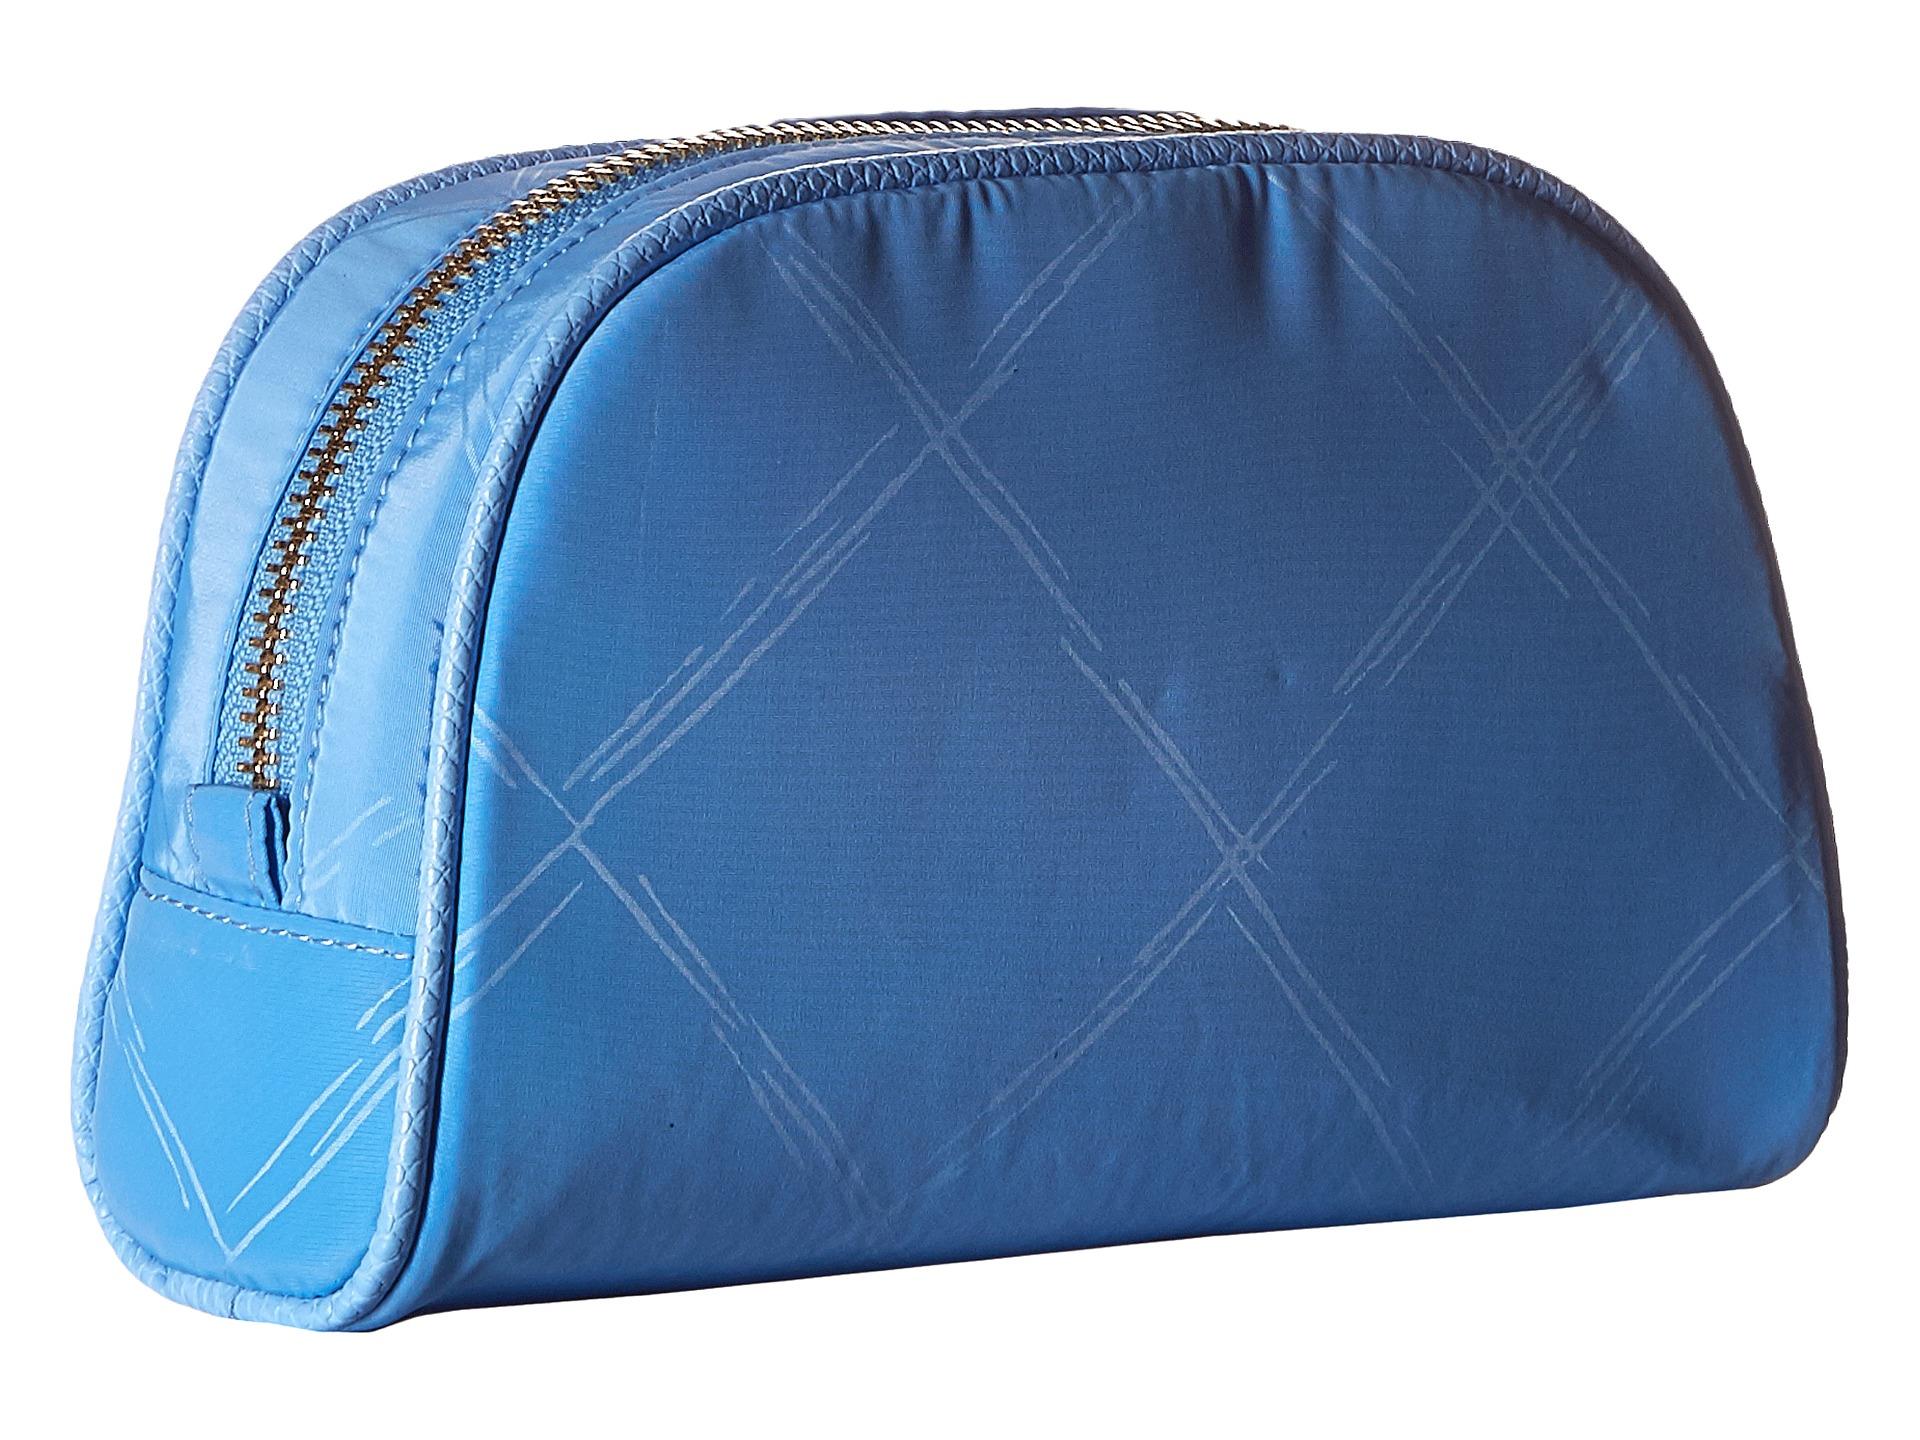 cb81e9456db0 Lyst - Vera Bradley Preppy Poly Small Cosmetic in Blue